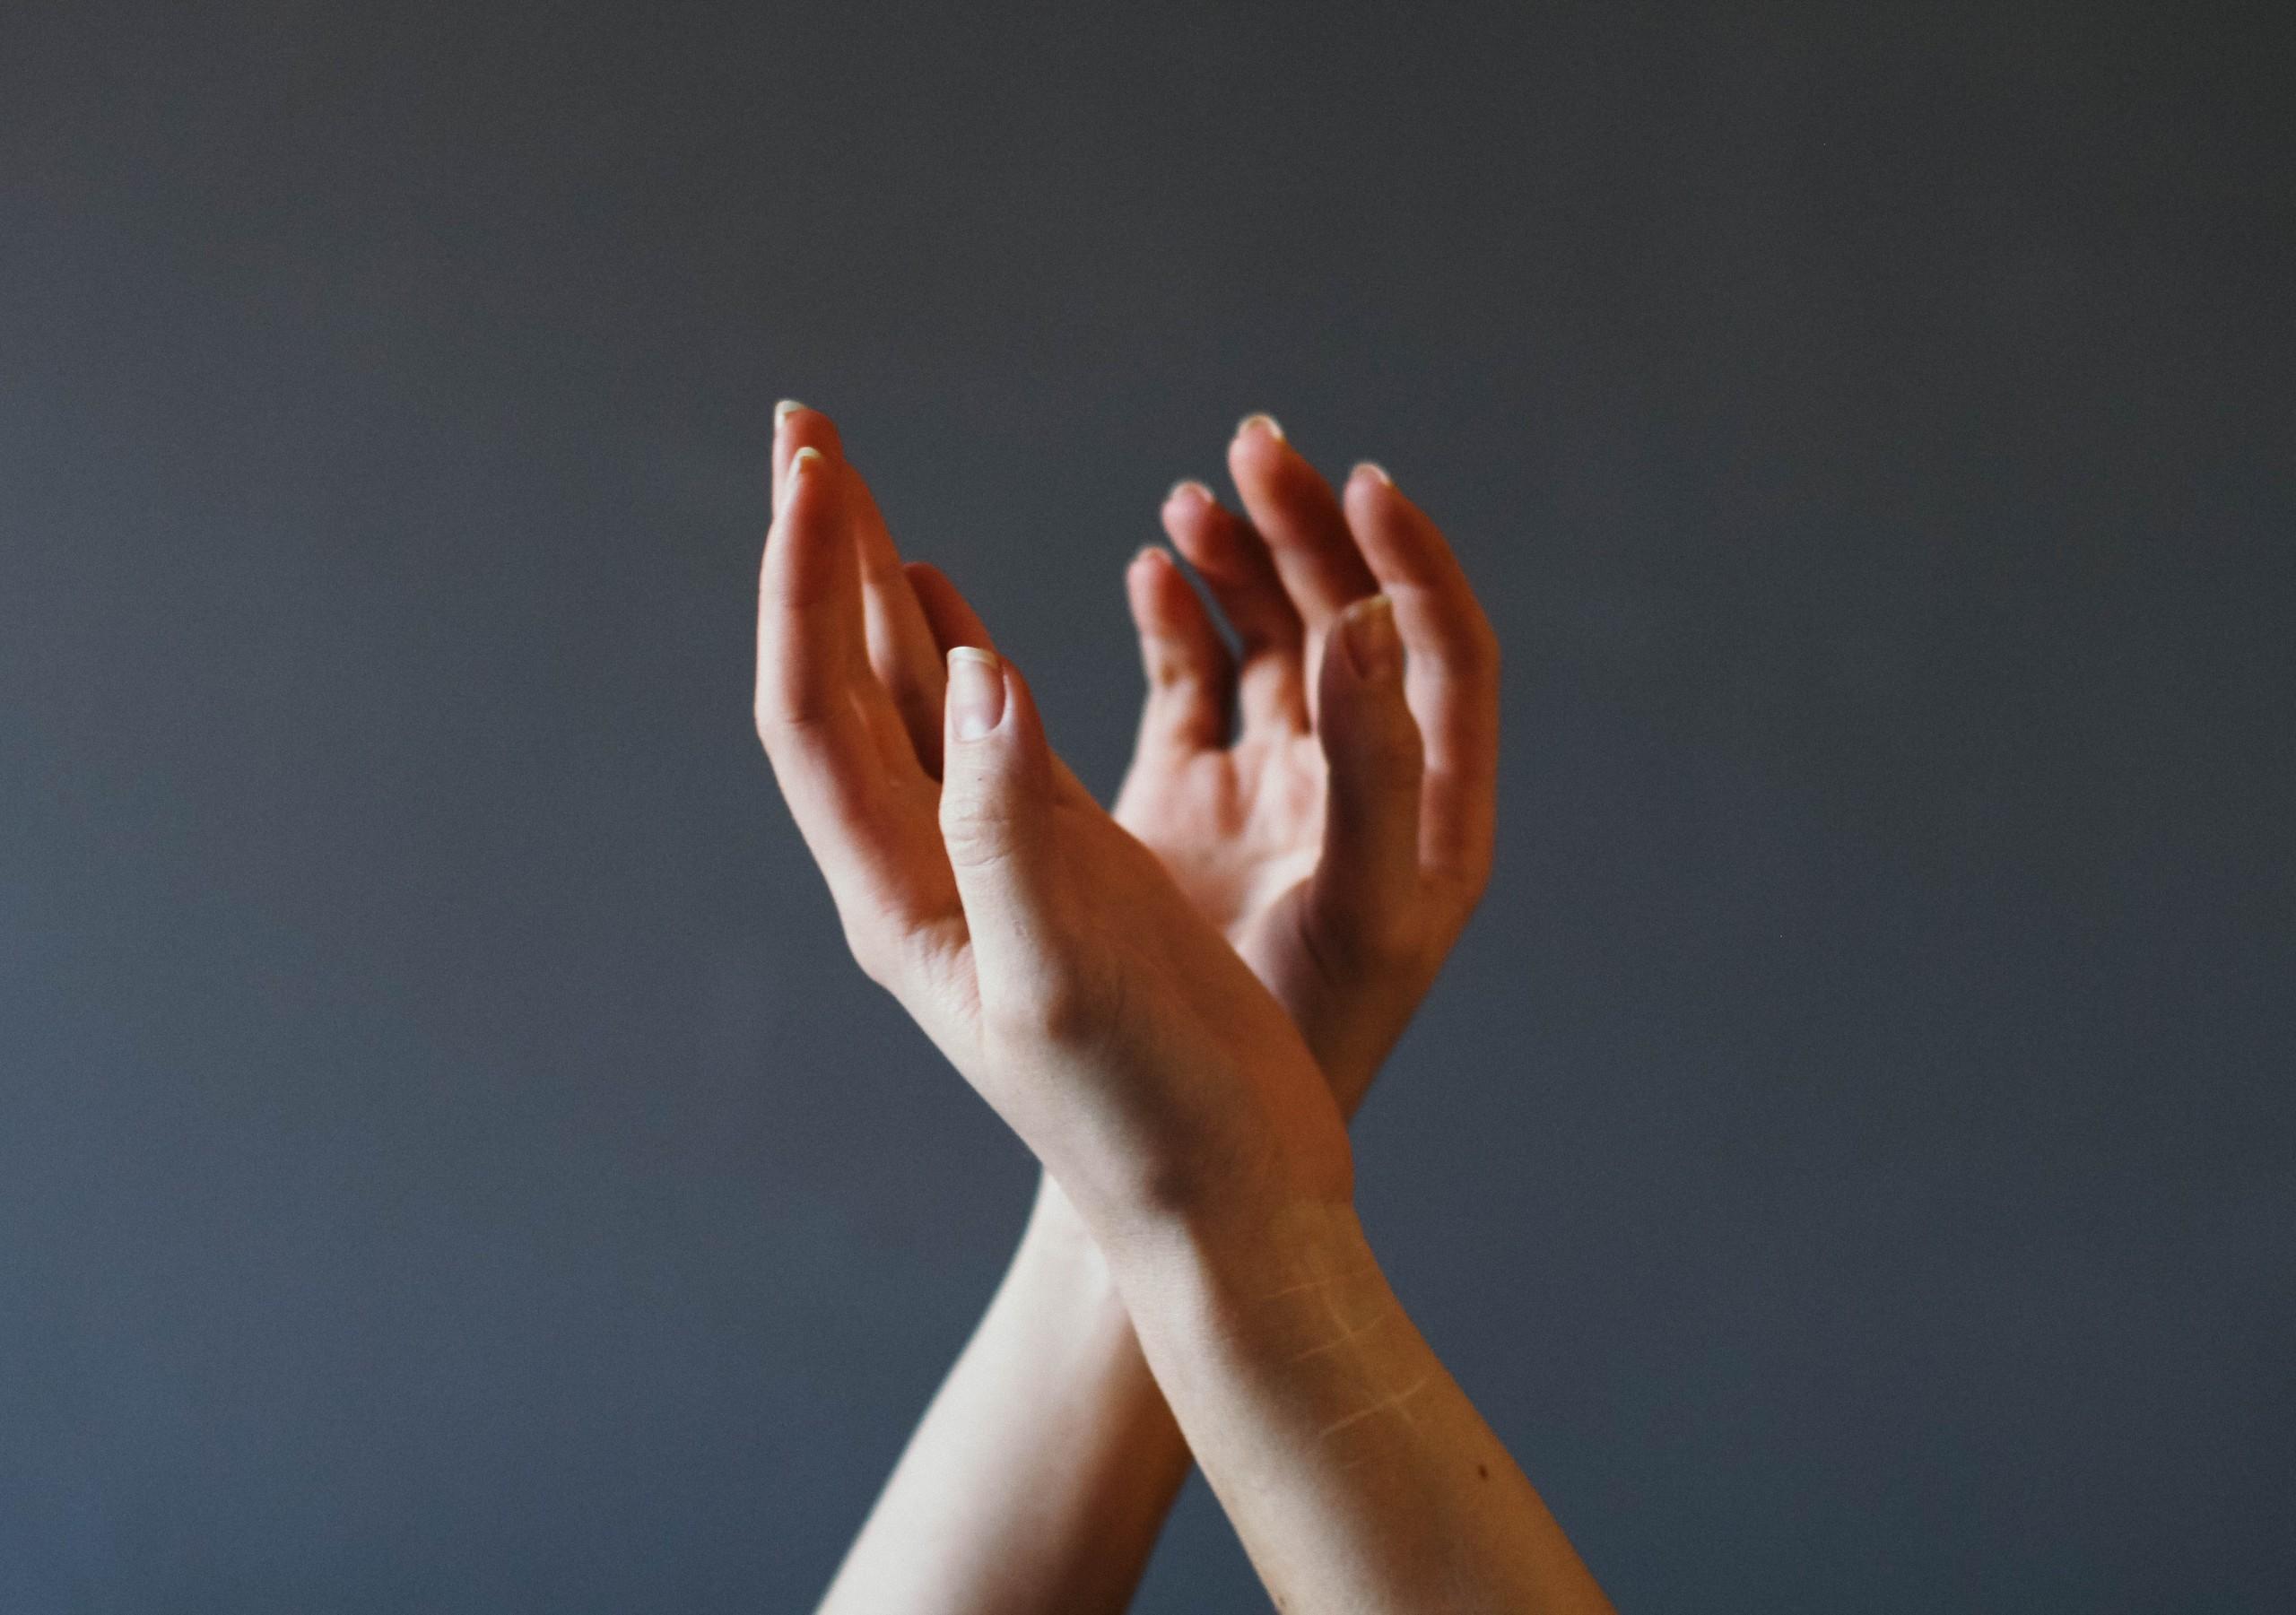 kädet kehollisuus tanssi